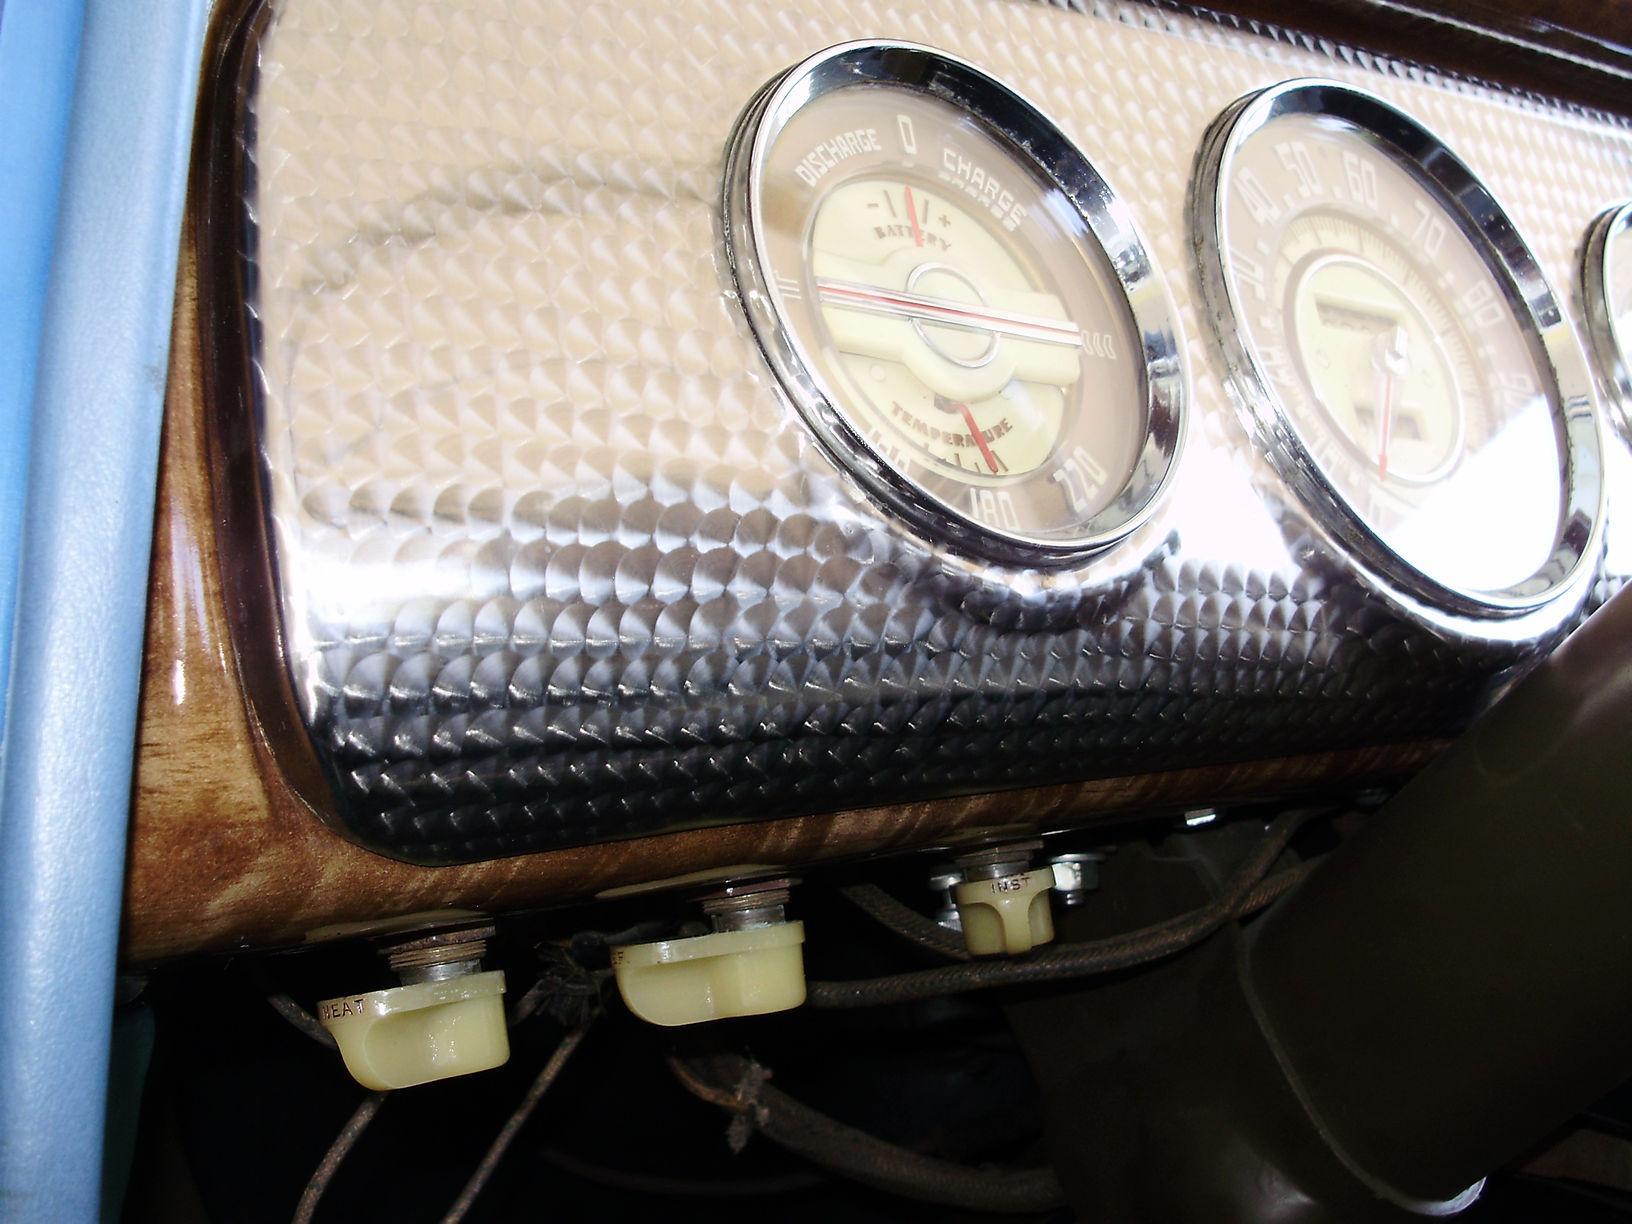 1940 BUICK CENTURY CONVERTIBLE SEDAN - Vintage Motors of Sarasota Inc. #31